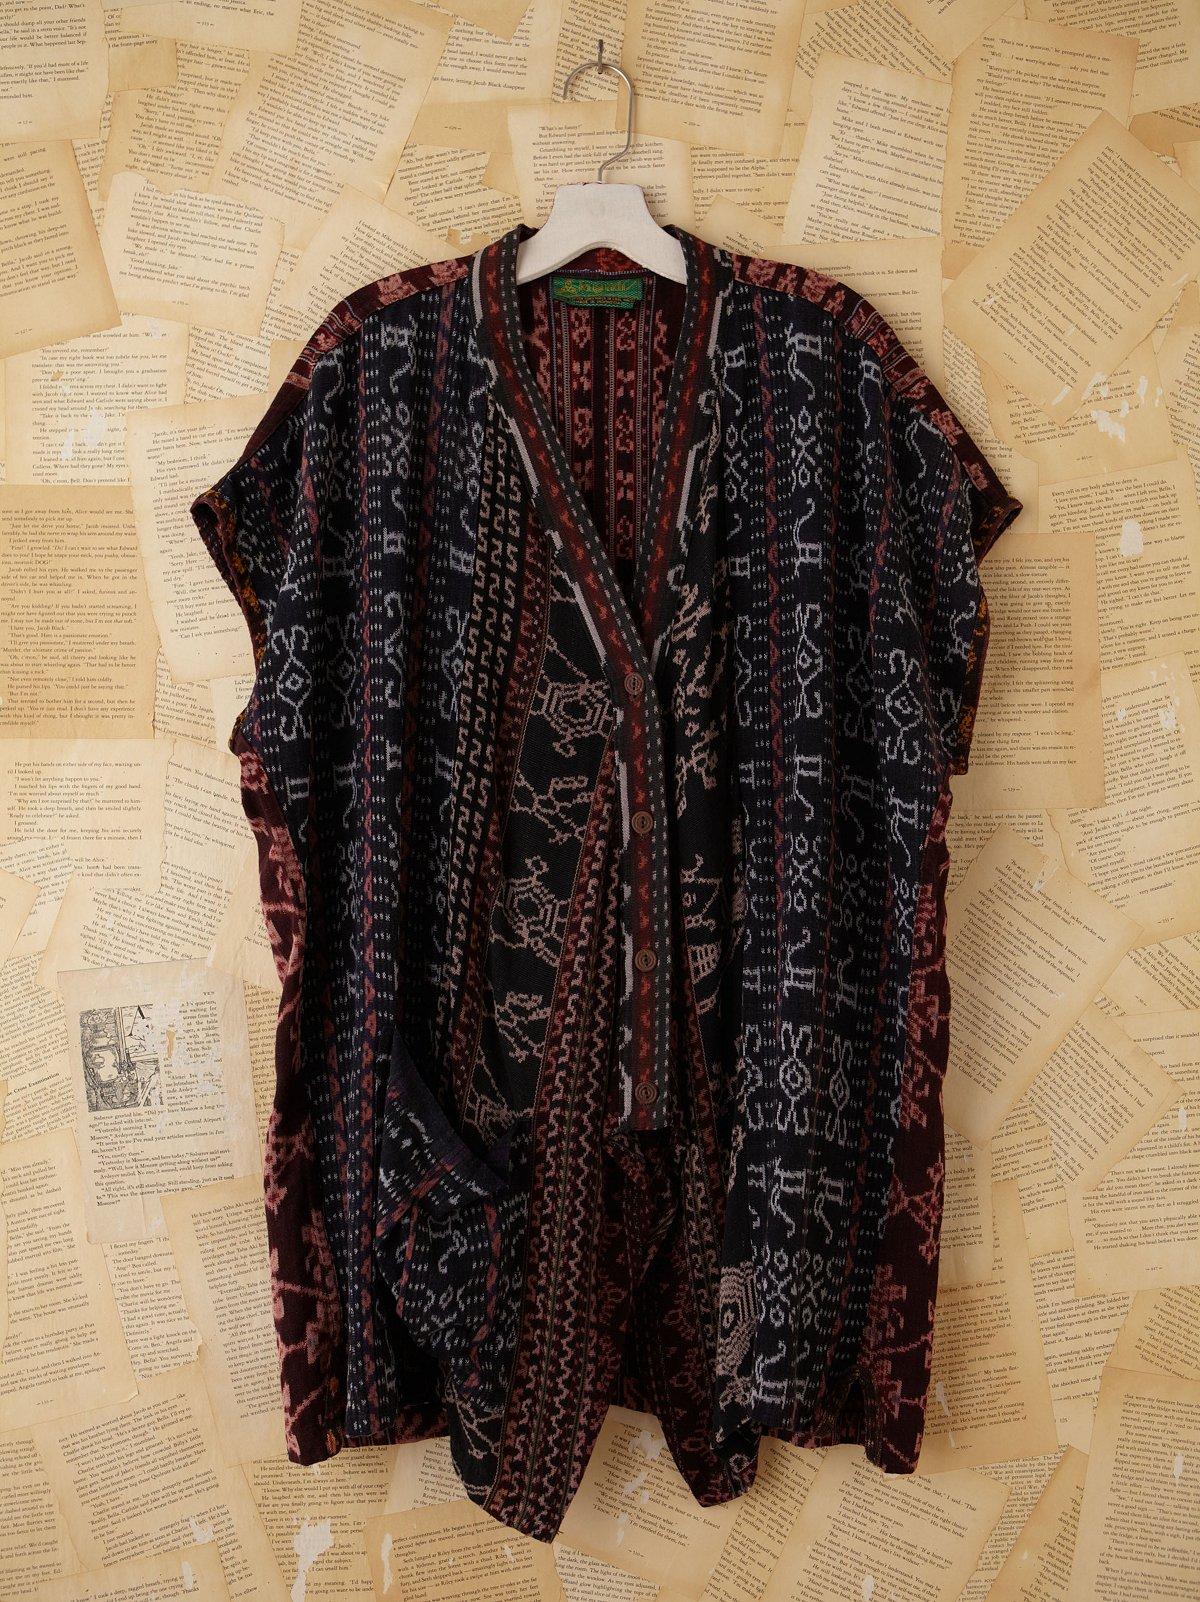 Vintage Batik Patterned Woven Kimono Jacket